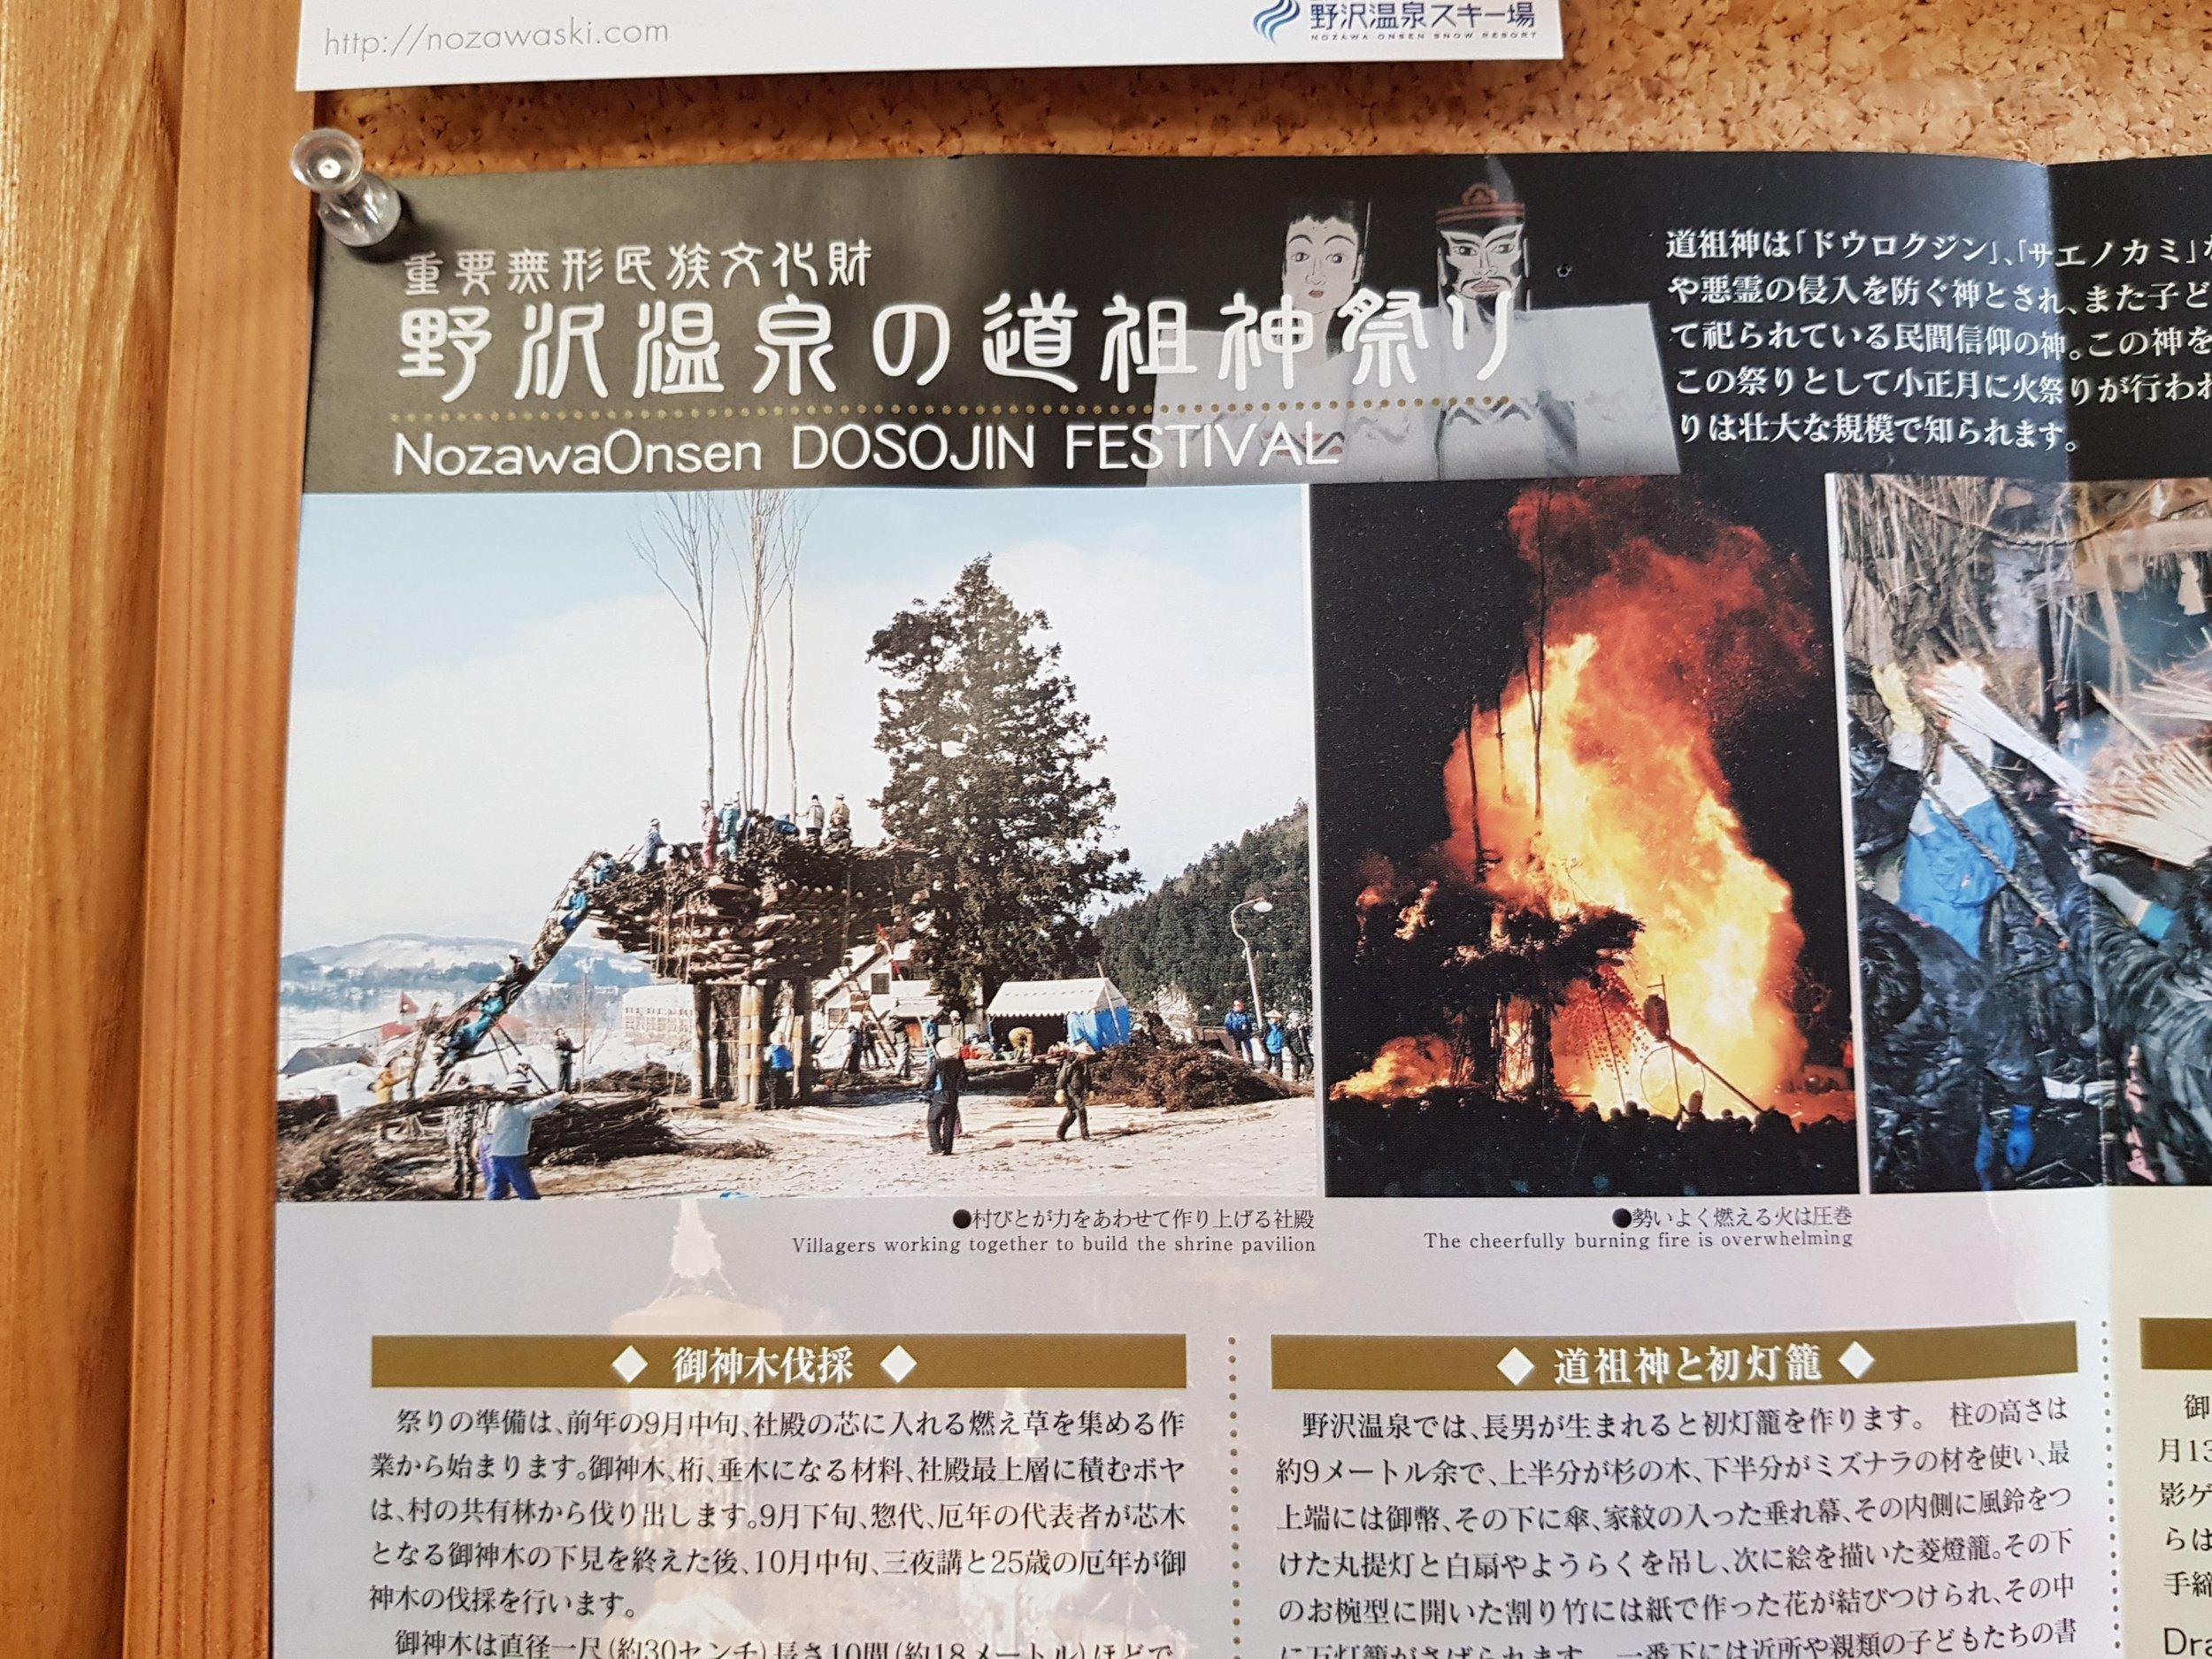 18-nozawa-onsen-dosojin-festival.jpg